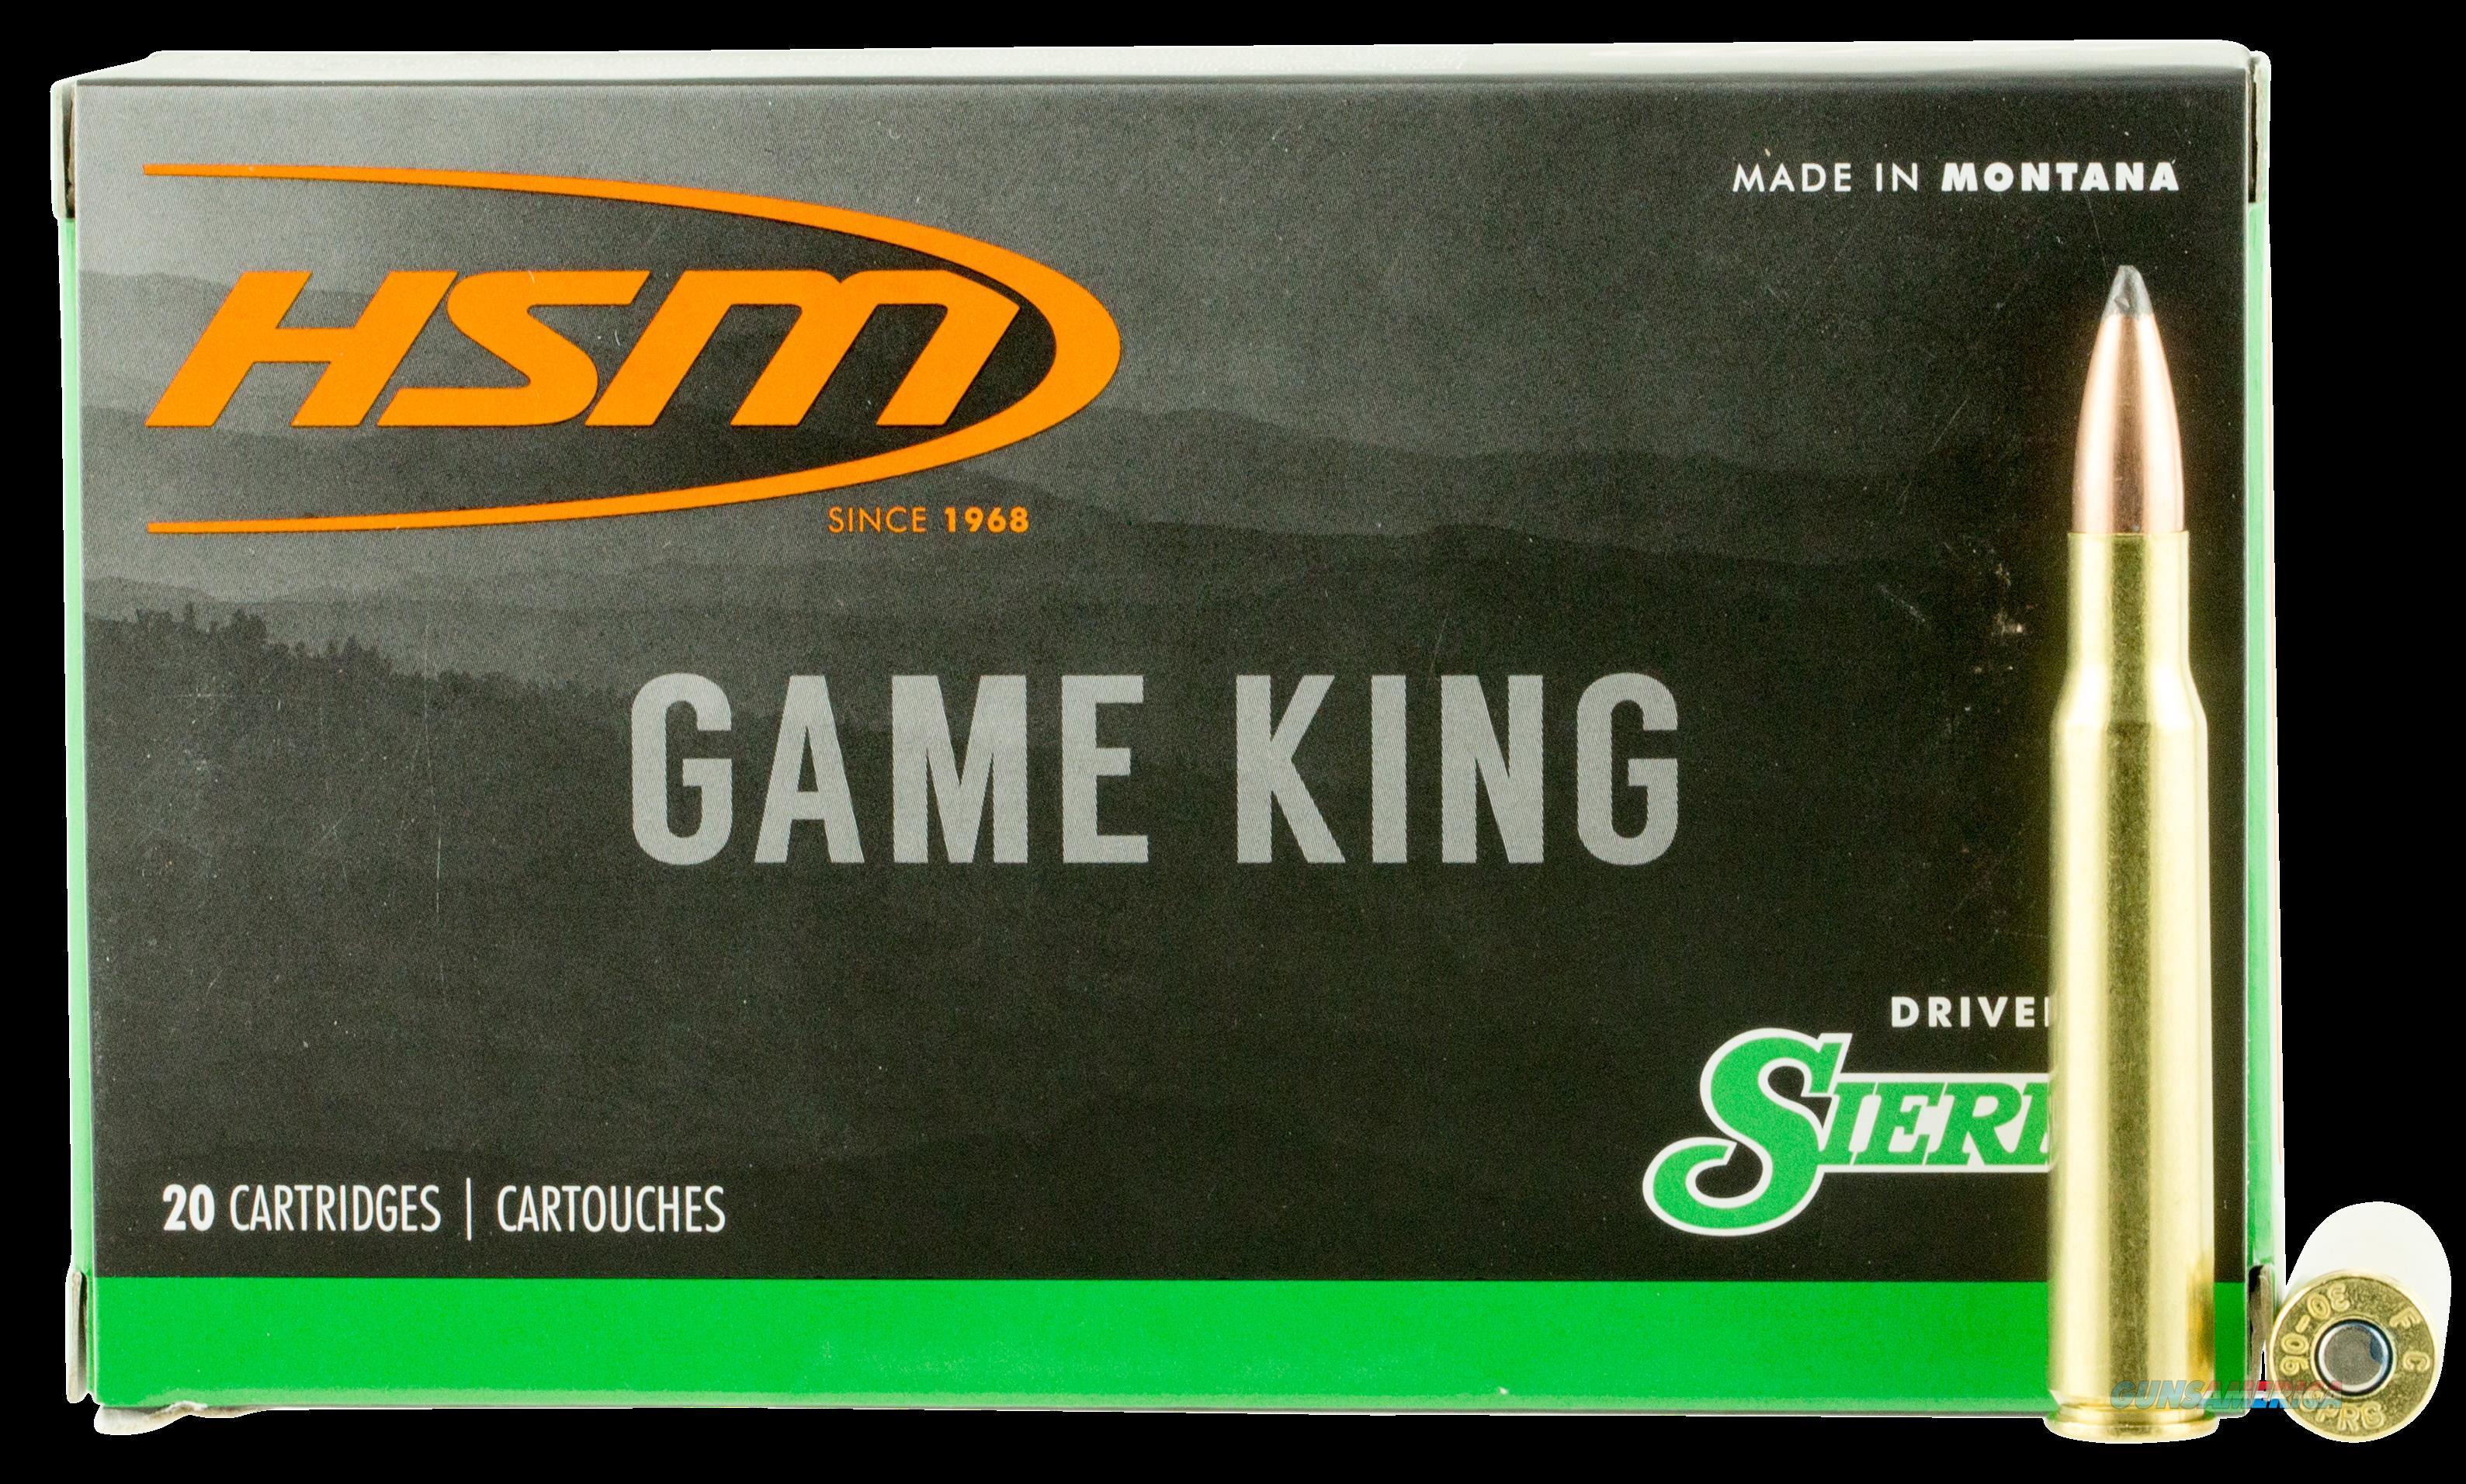 Hsm Game King, Hsm 300639n            3006     150 Sbt  Gk  20-20  Guns > Pistols > 1911 Pistol Copies (non-Colt)